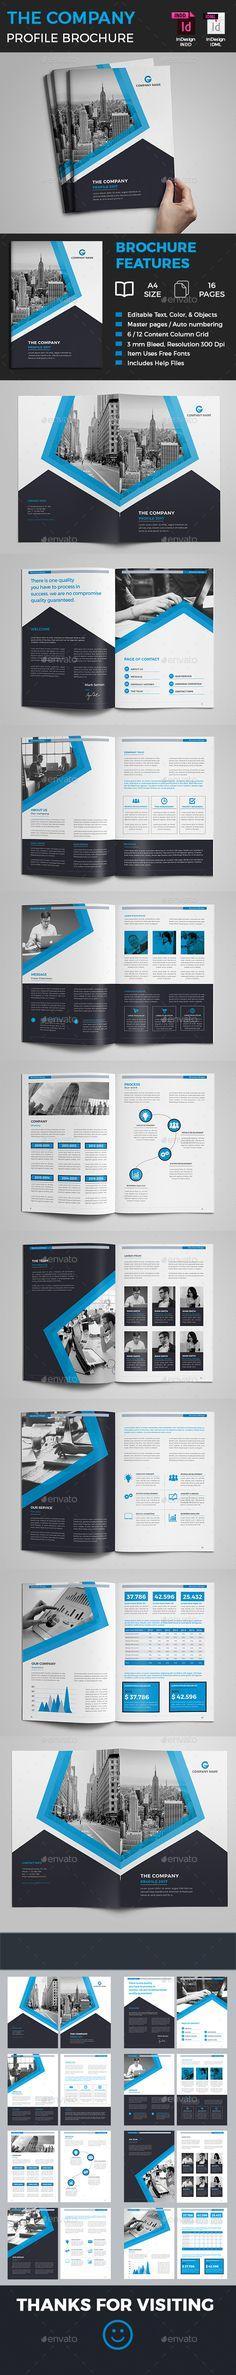 Company Profile - #Corporate #Brochures Download here:  https://graphicriver.net/item/company-profile/19595549?ref=alena994